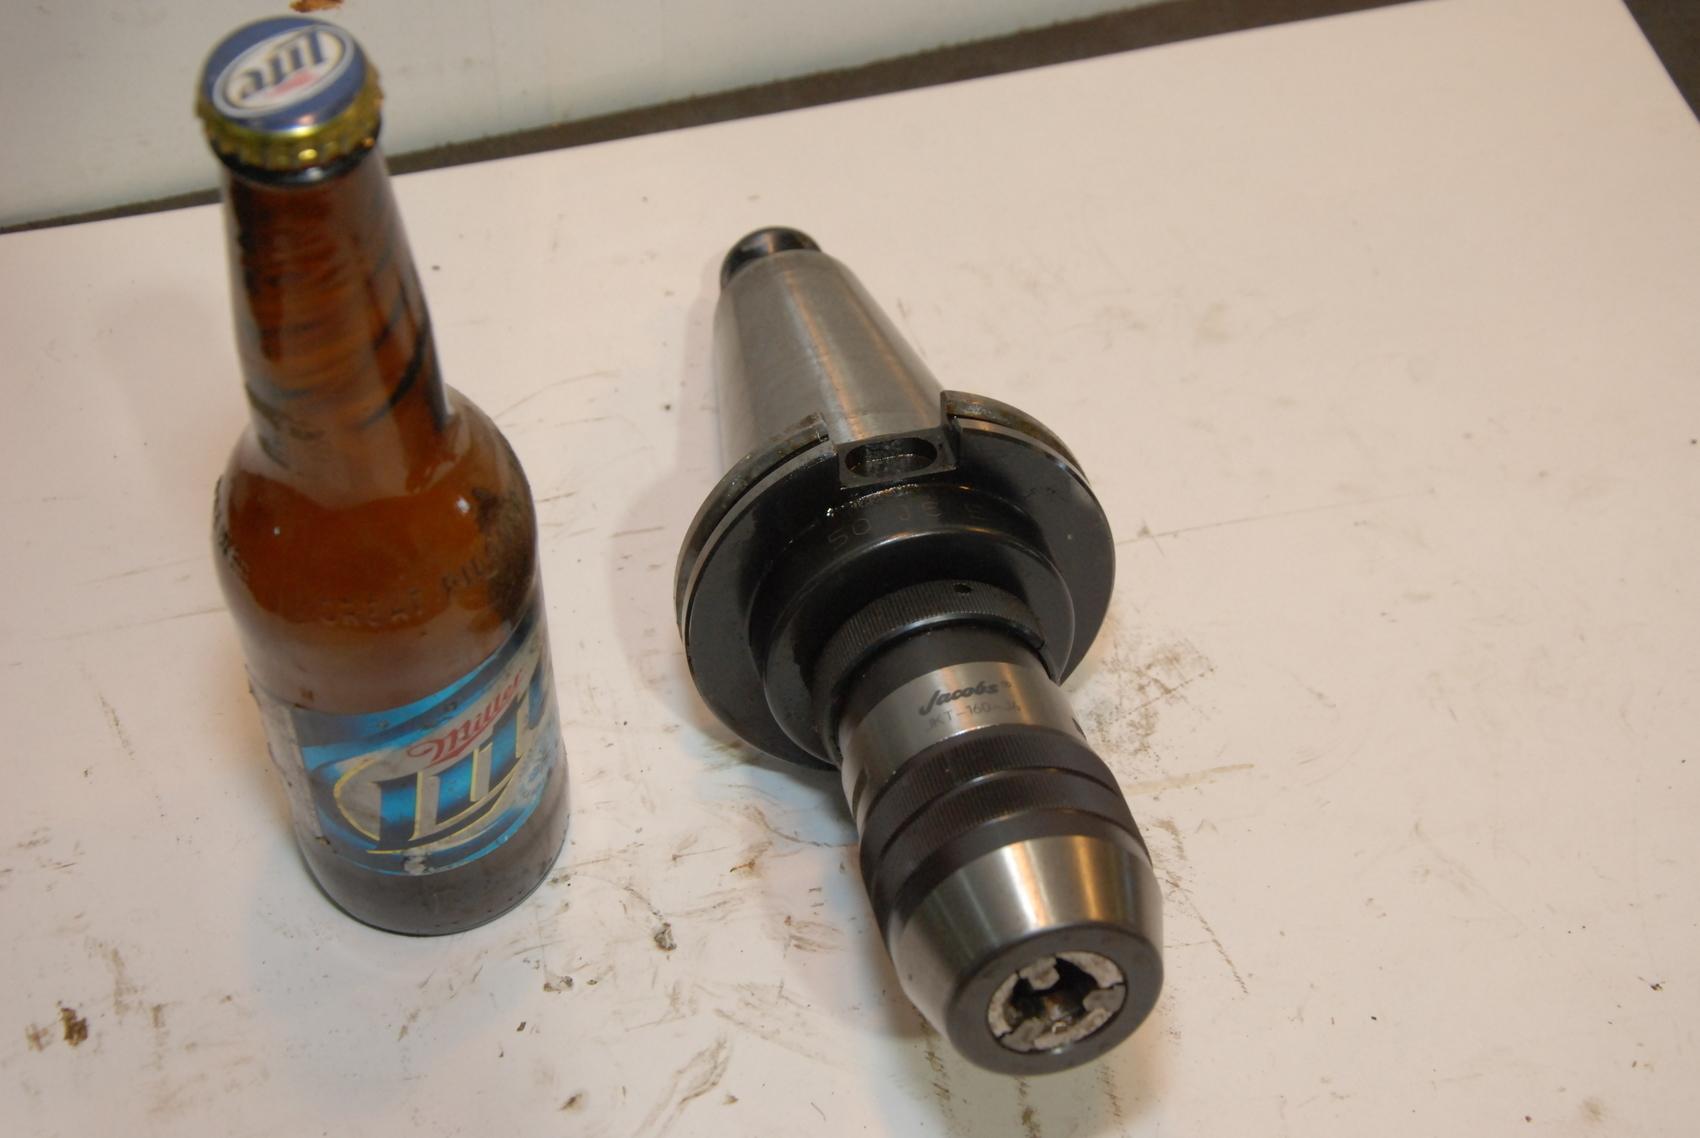 Jacobs JKT160-J6 Hi-Torque Industrial Keyless Drill Chuck W/HOLDER